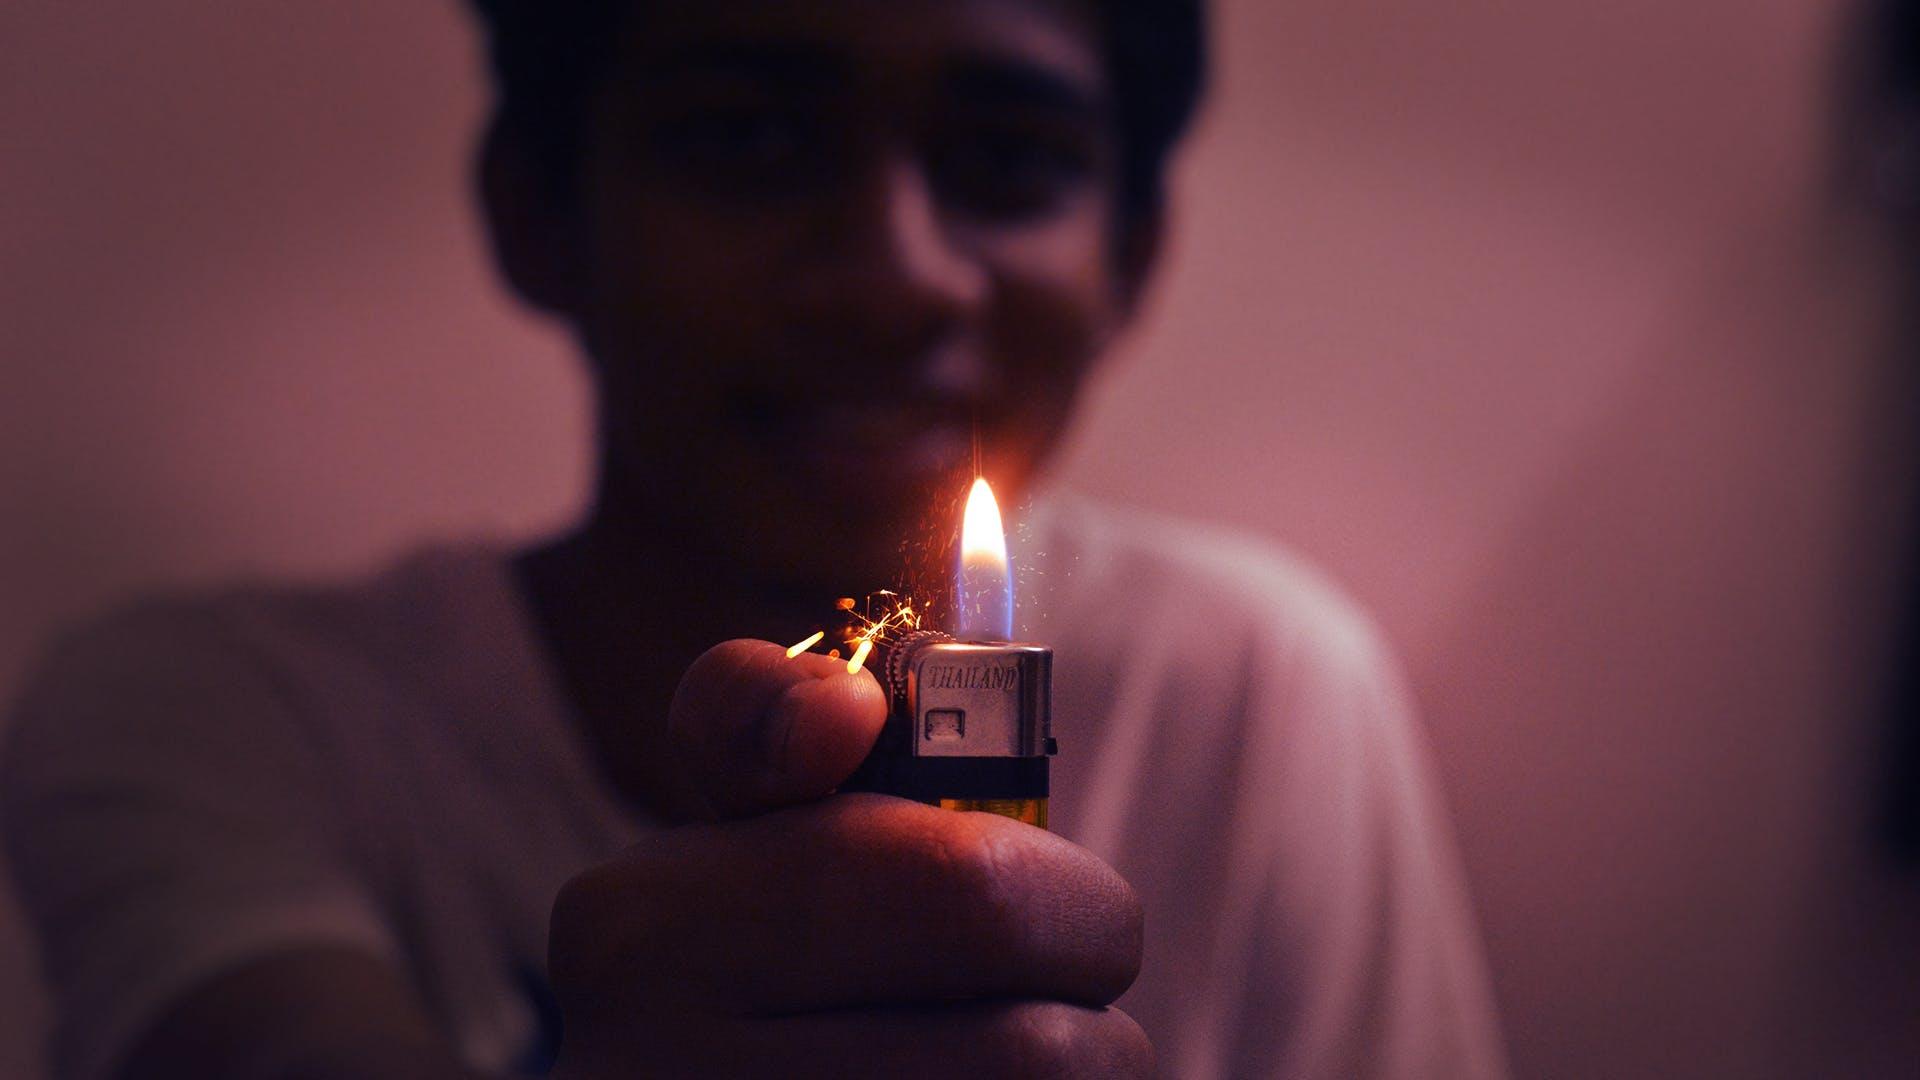 Man Holding Disposable Lighter